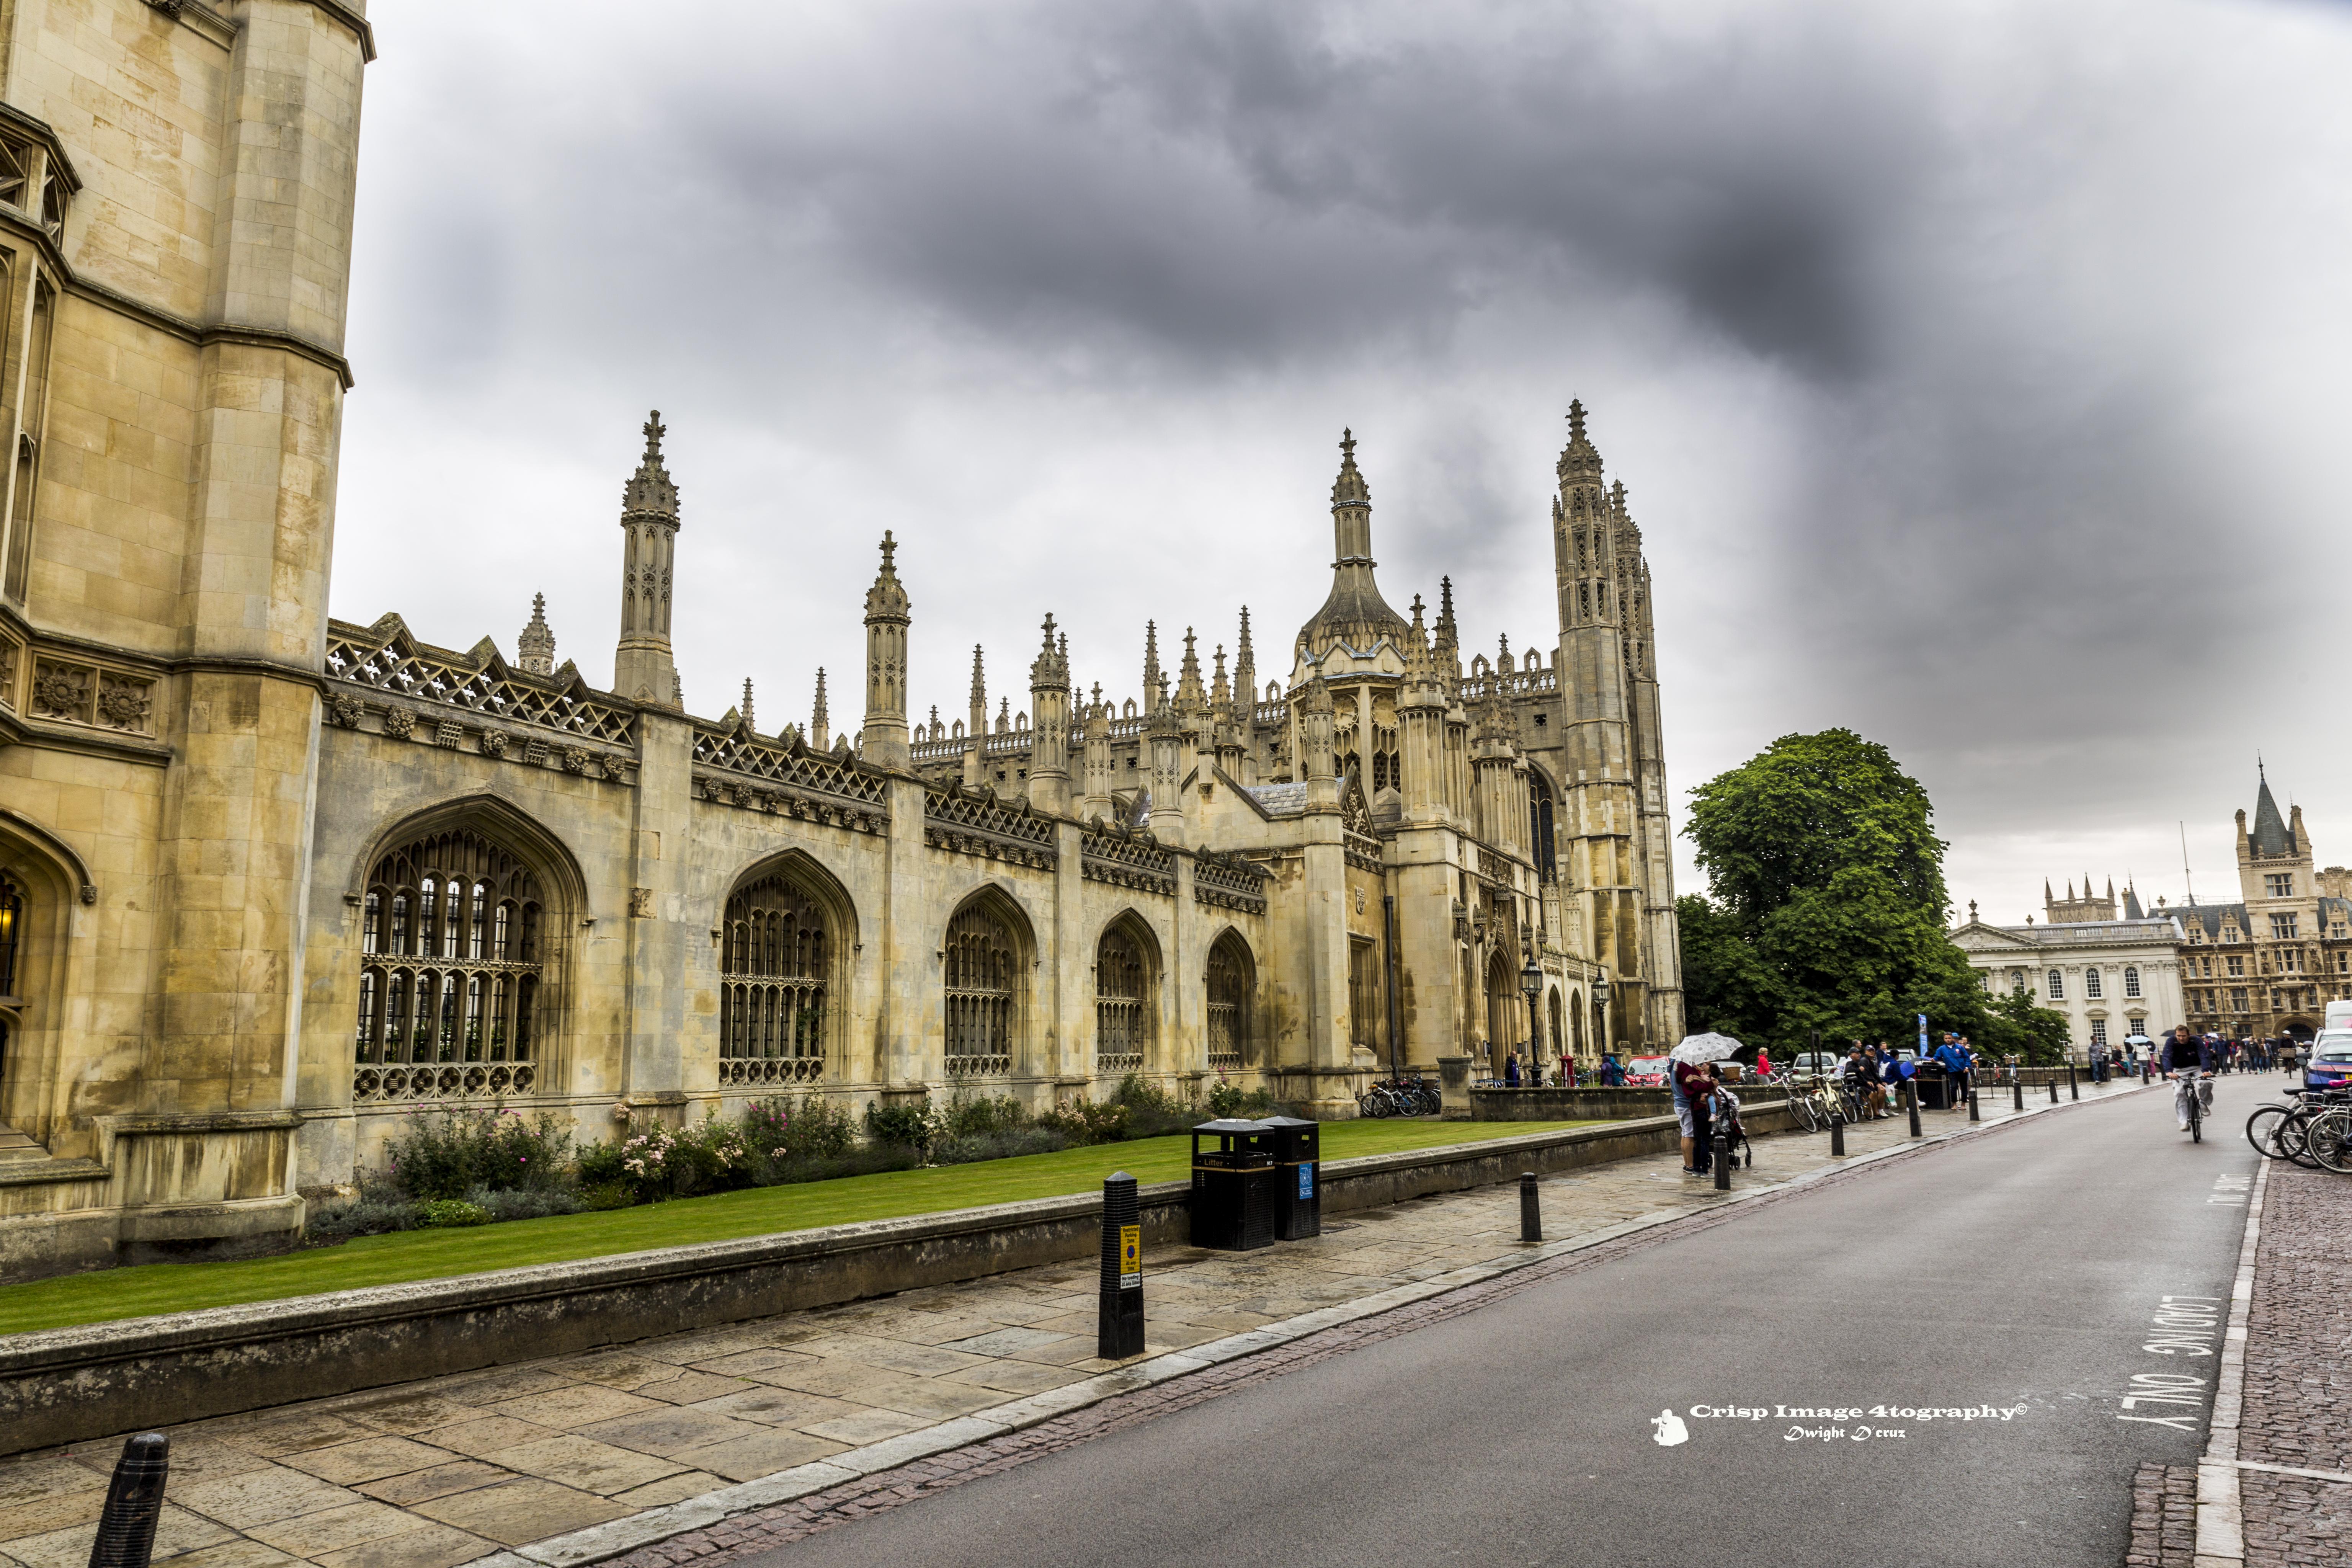 UK Architecture